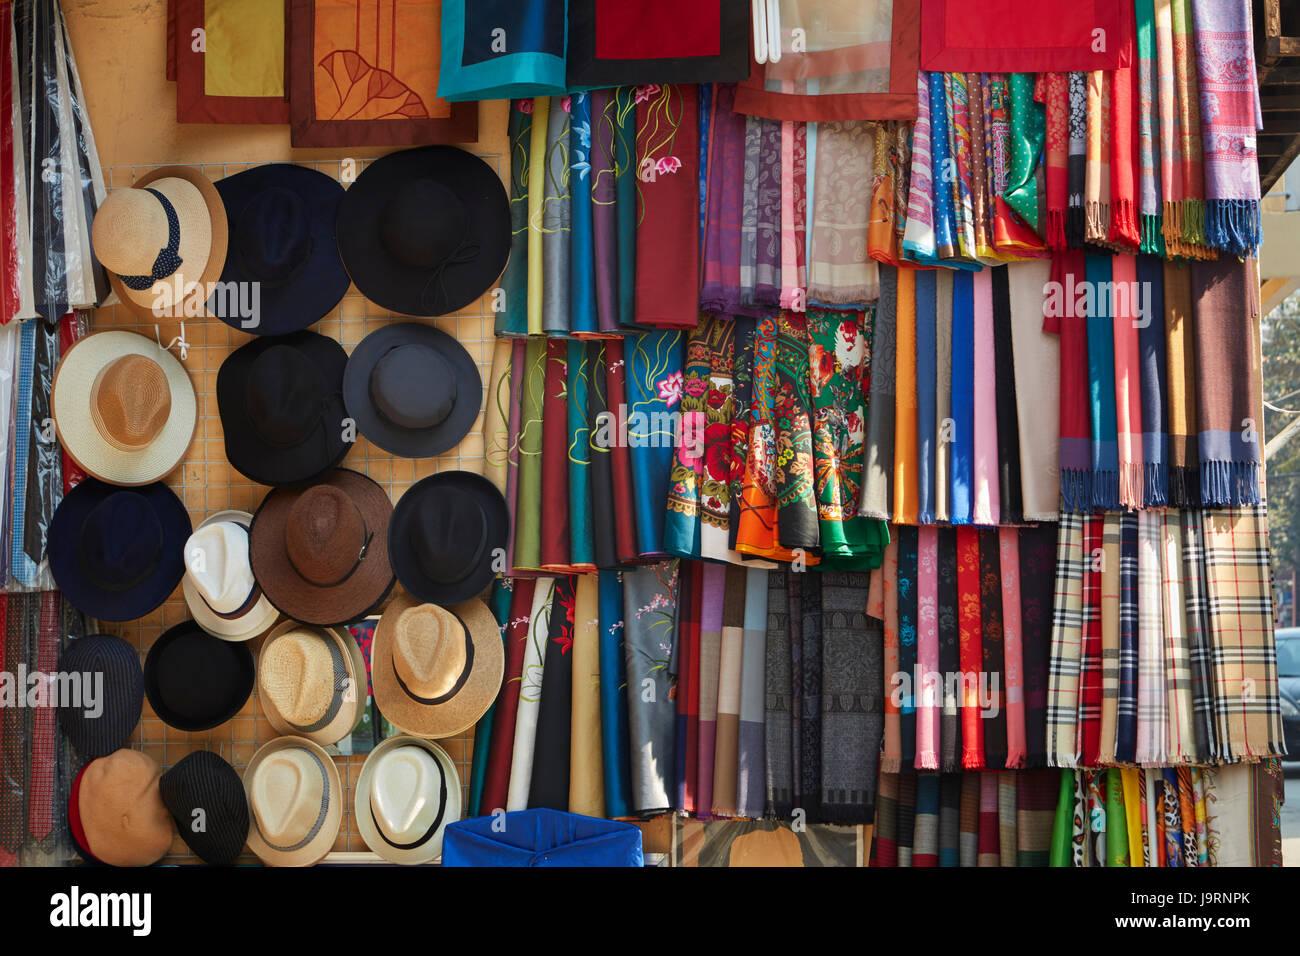 Hüte und Material im Shop, Altstadt, Hanoi, Vietnam Stockbild